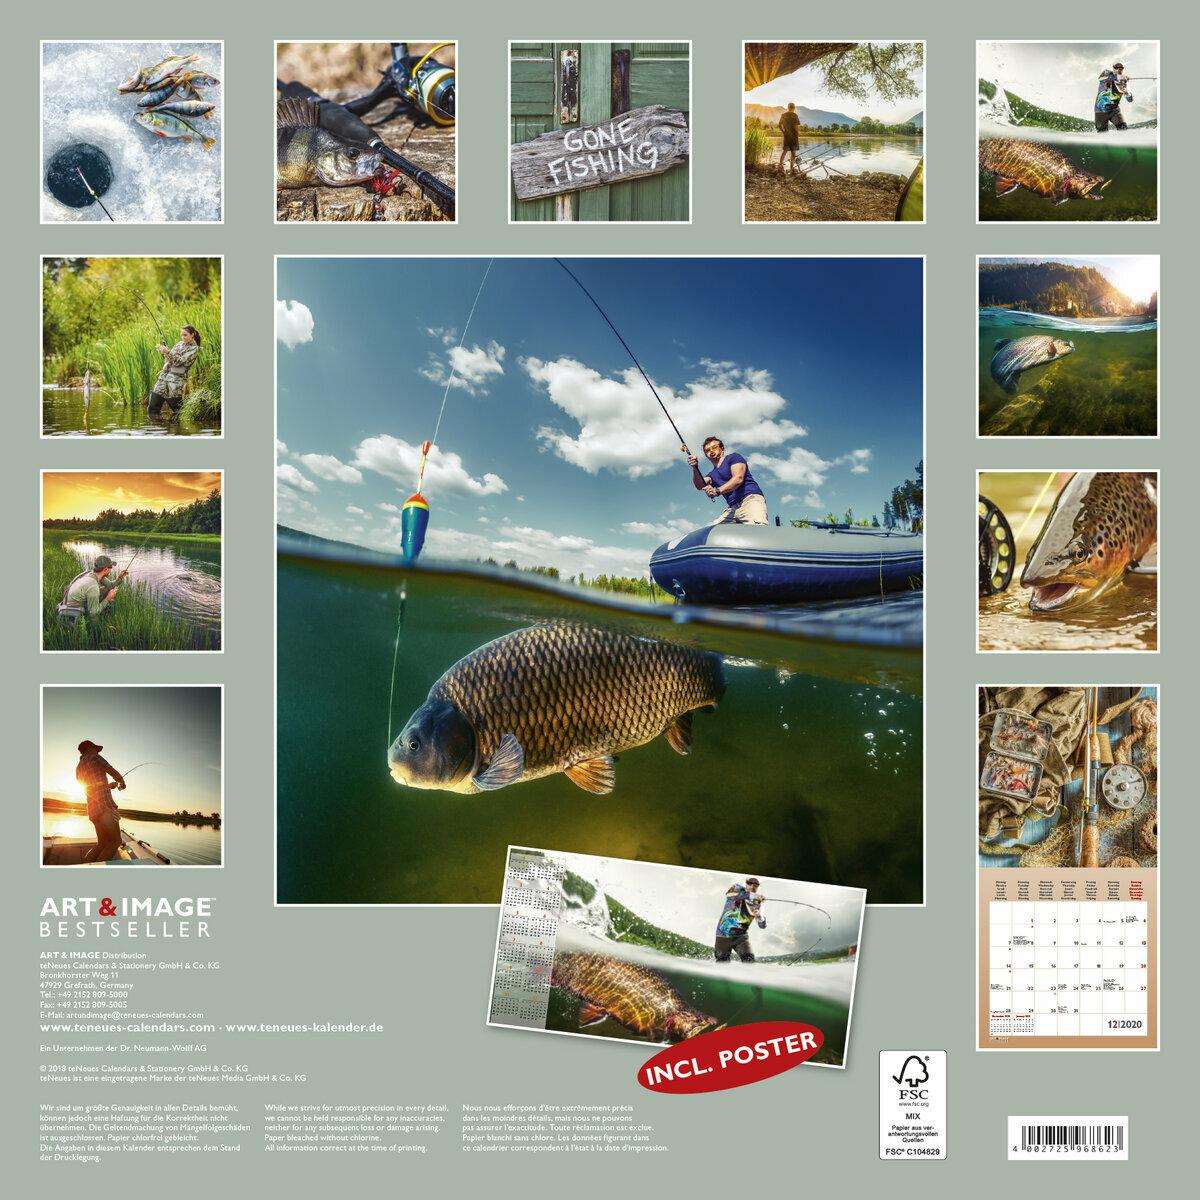 Calendrier De Peche 2020.Calendrier 2020 Peche A La Ligne Avec Poster Offert